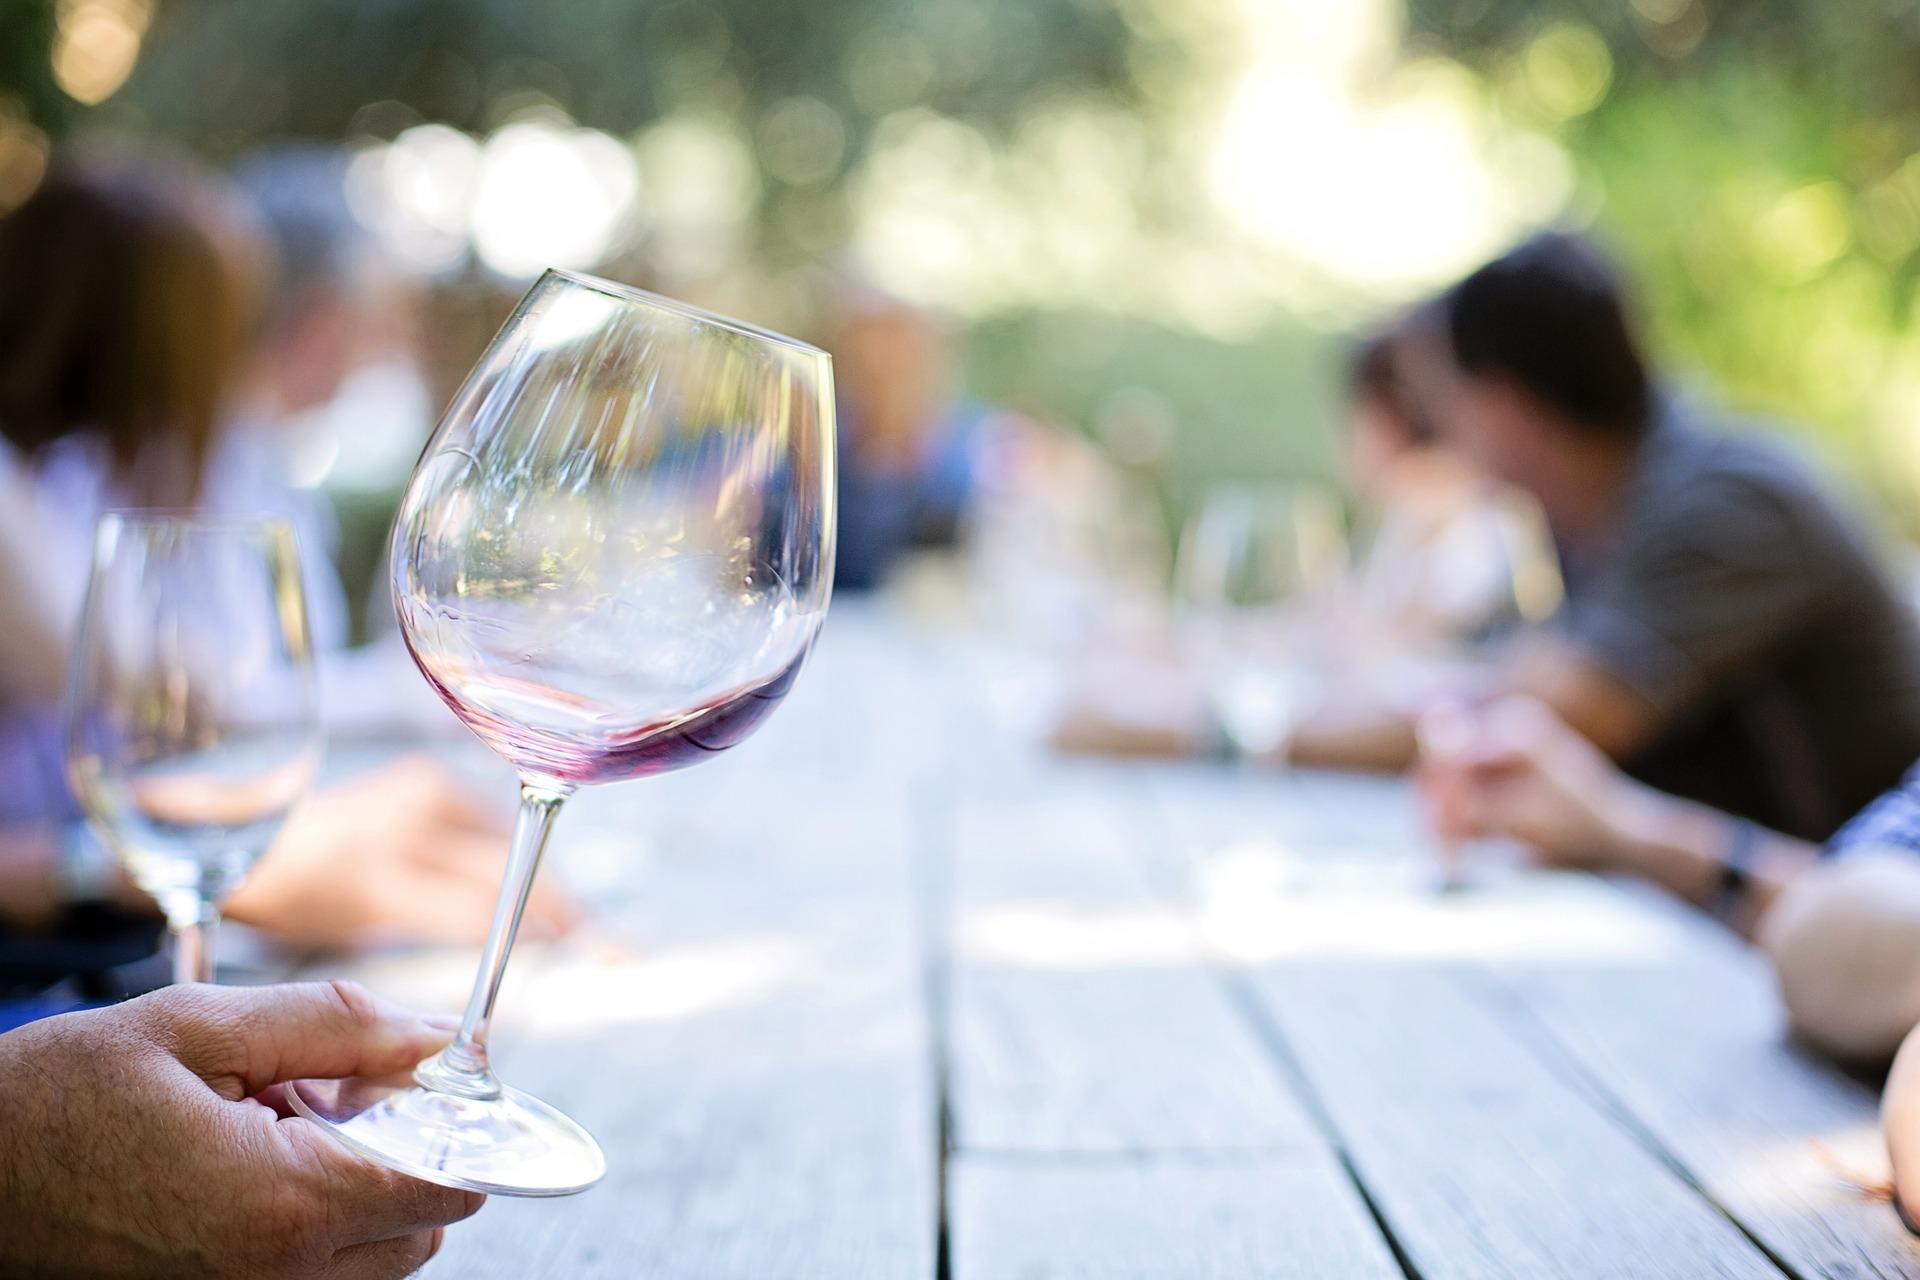 wine-tasting-negroamaro-primitivo-salento-valle d'itria-puglia-apulien-rosso-rosato-vigneti